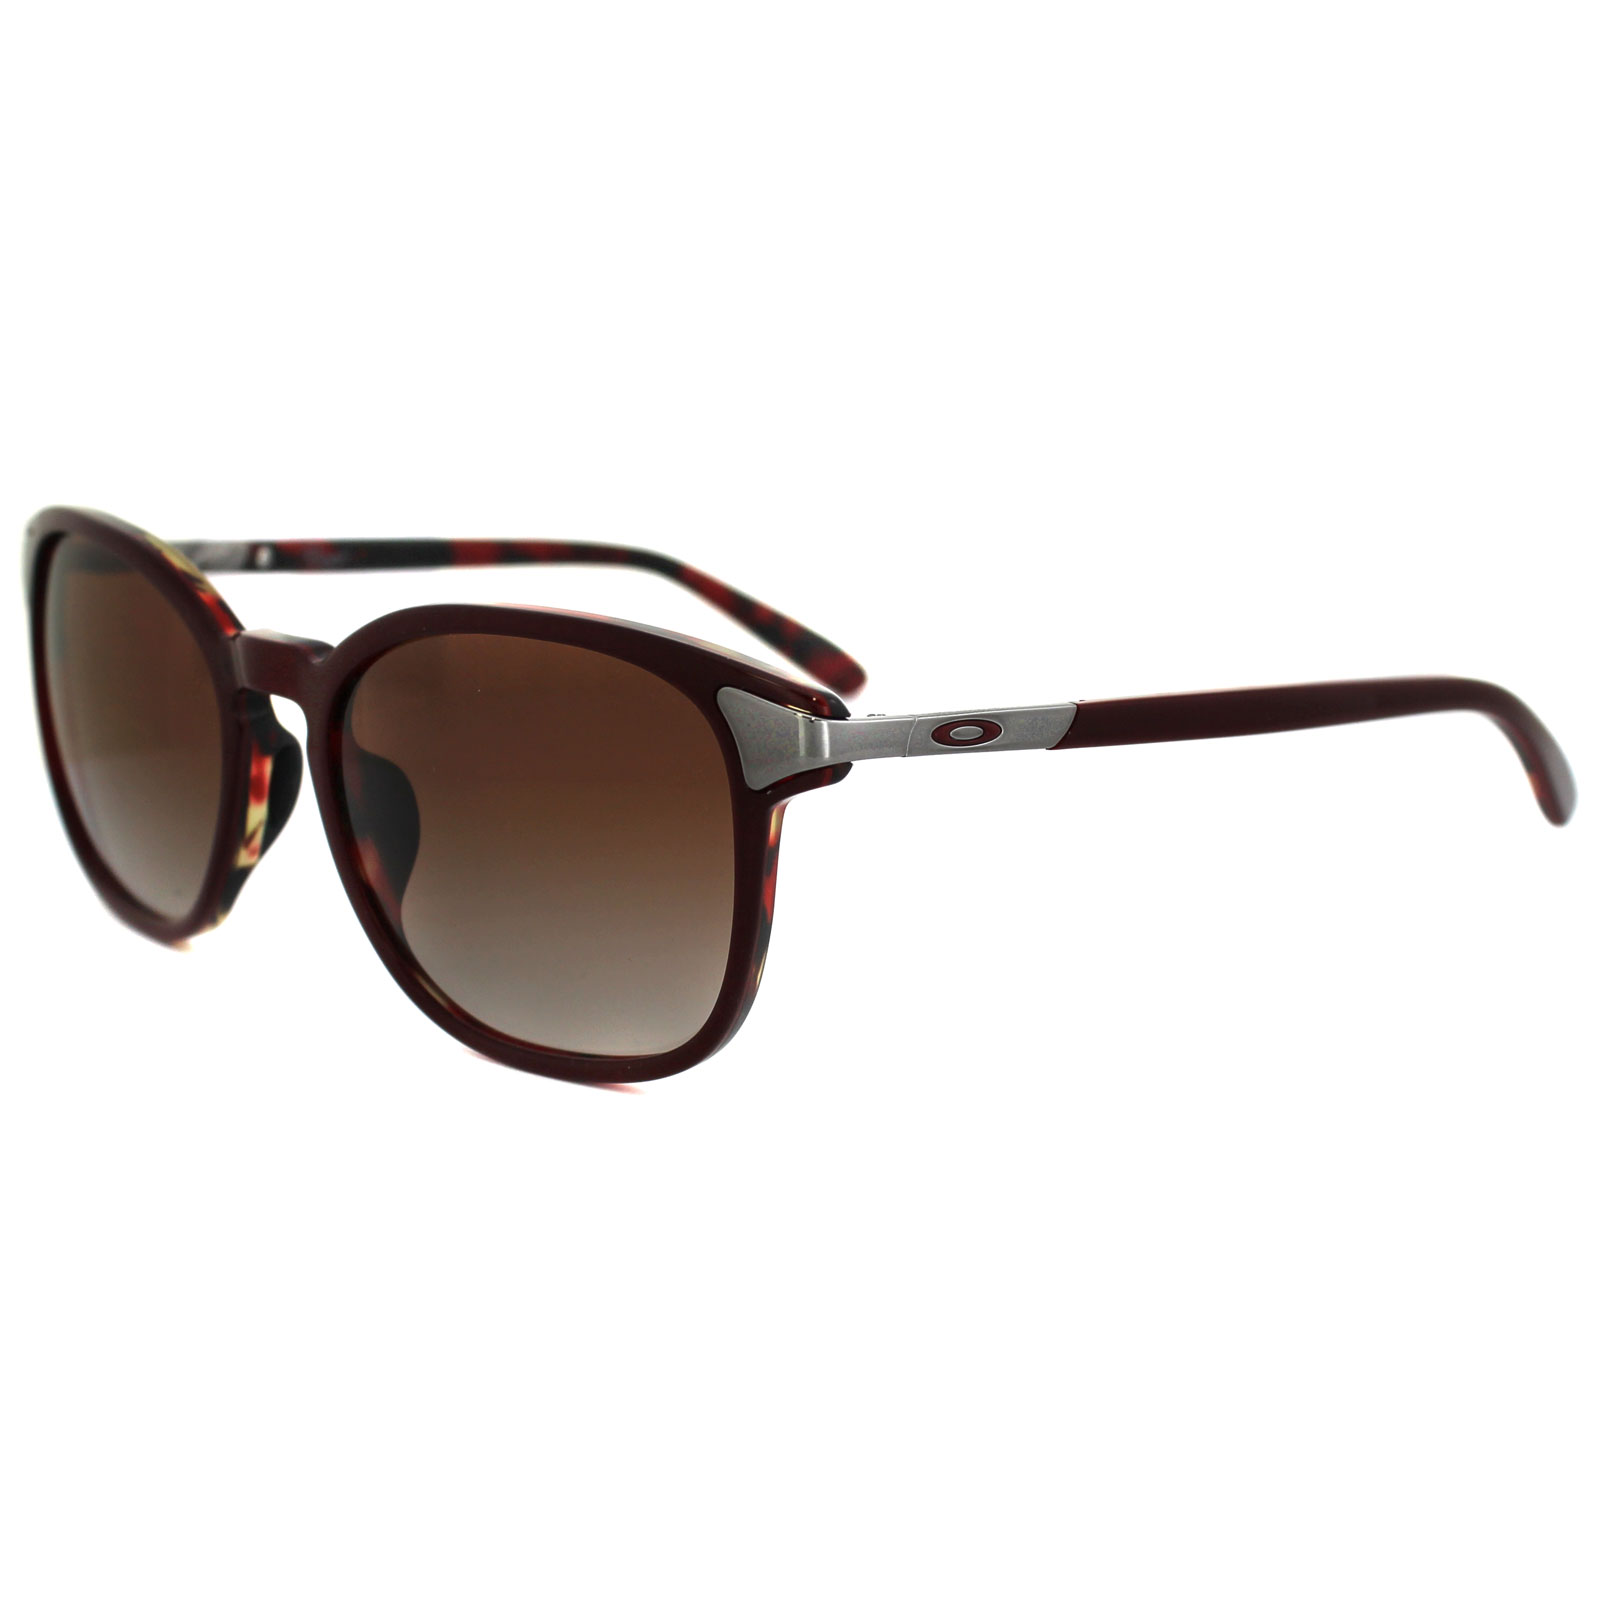 7aee1e8c71d1 Cheap Oakley Dispatch Sunglasses Uk